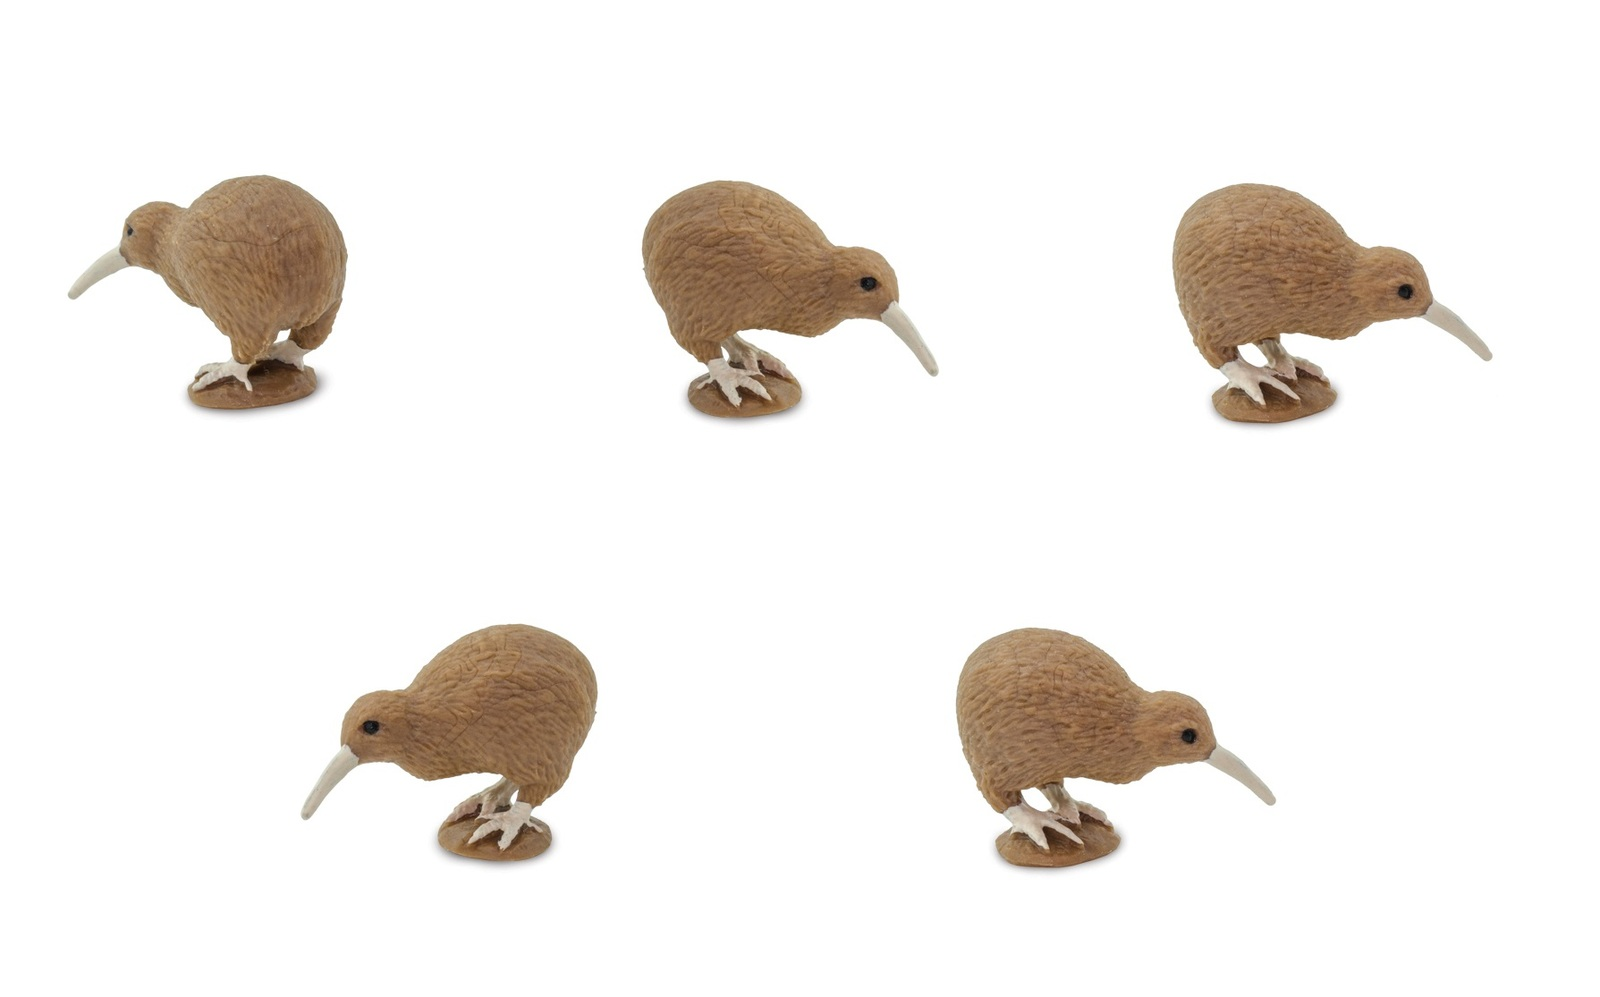 Safari: Good Luck - Mini Kiwi (Assorted Designs) image